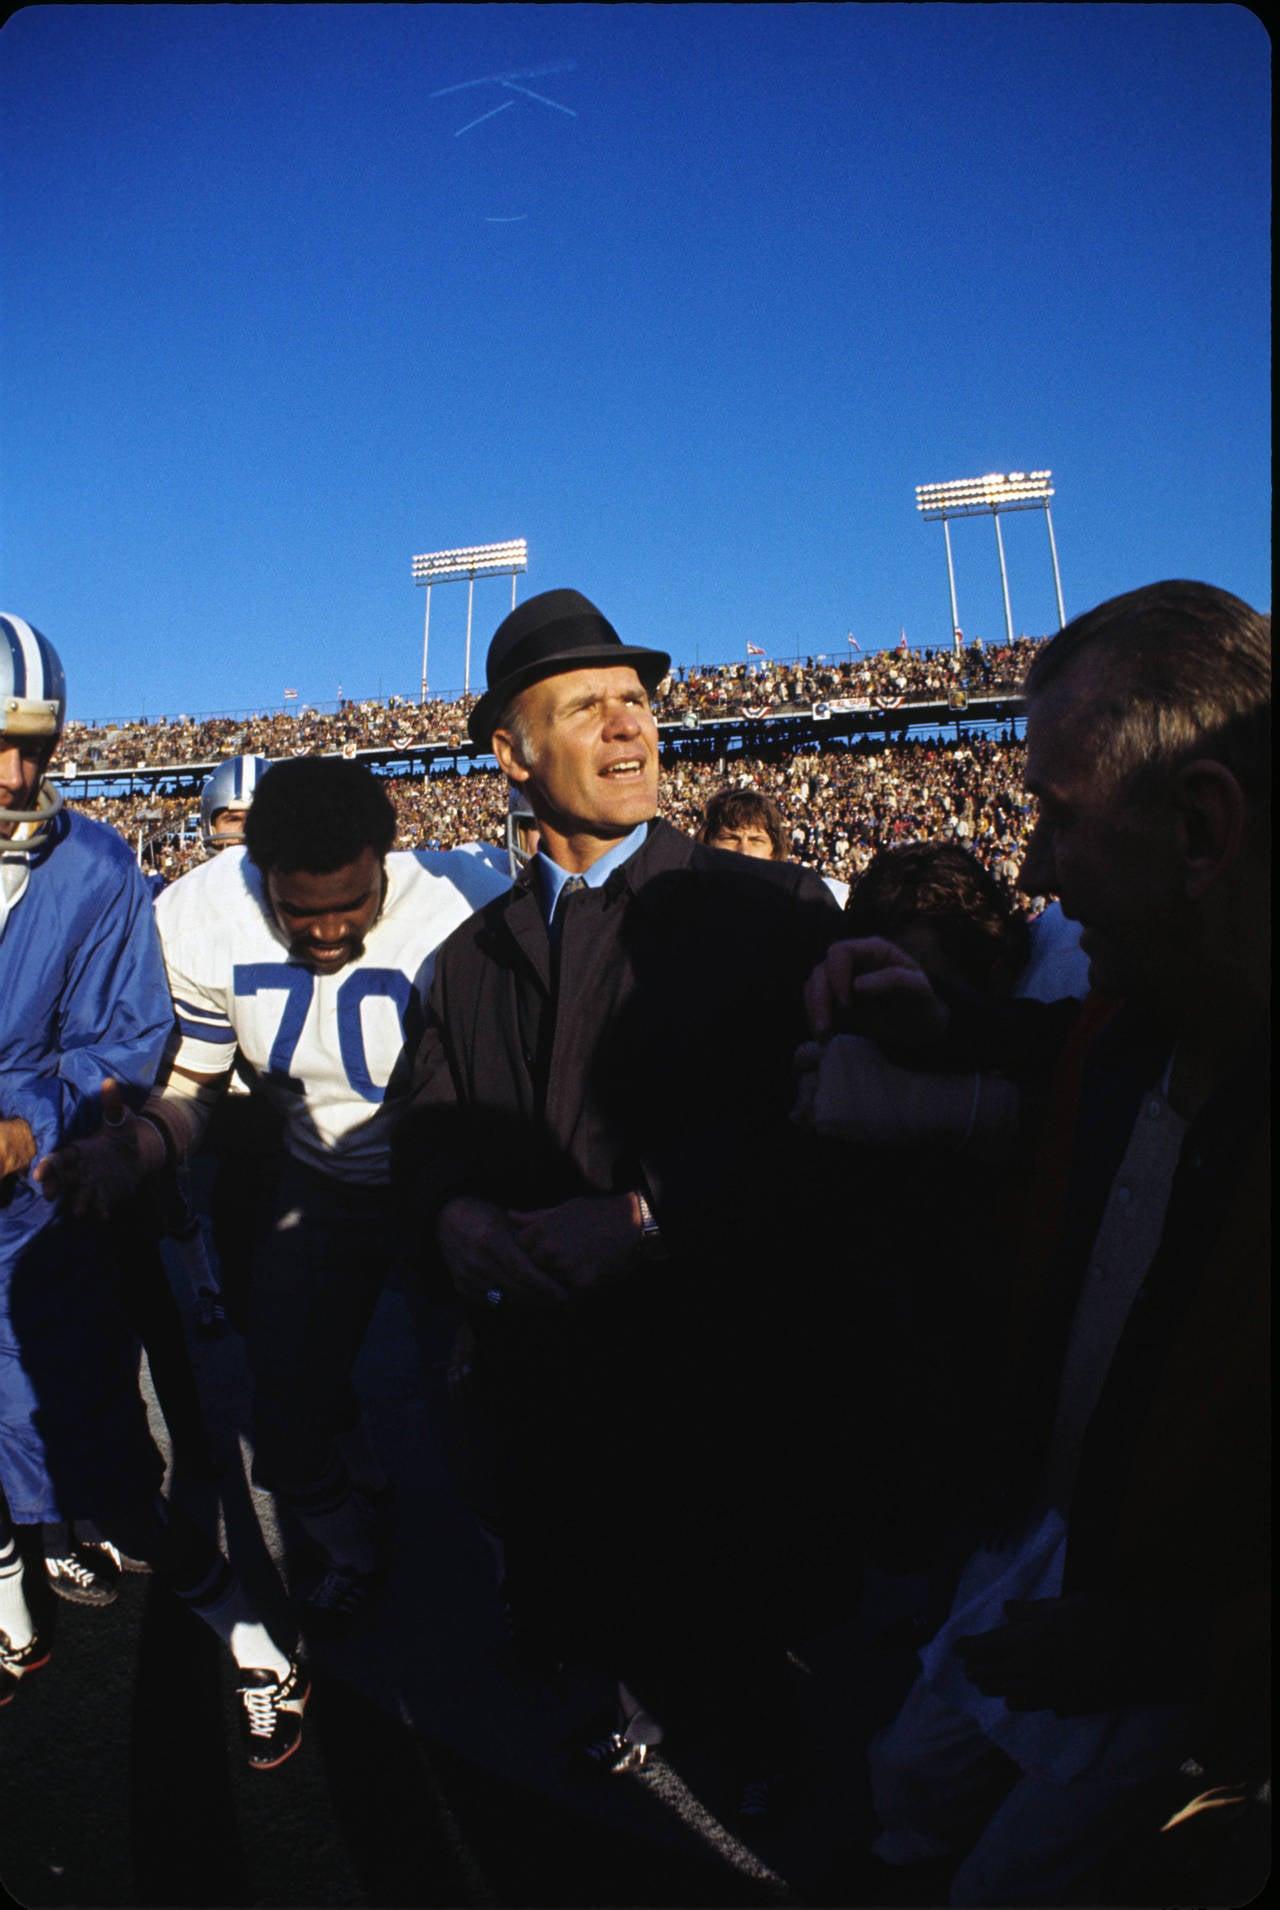 Tom Landry with Blue Sky, Super Bowl VI, Dallas Cowboys vs. Miami Dolphins